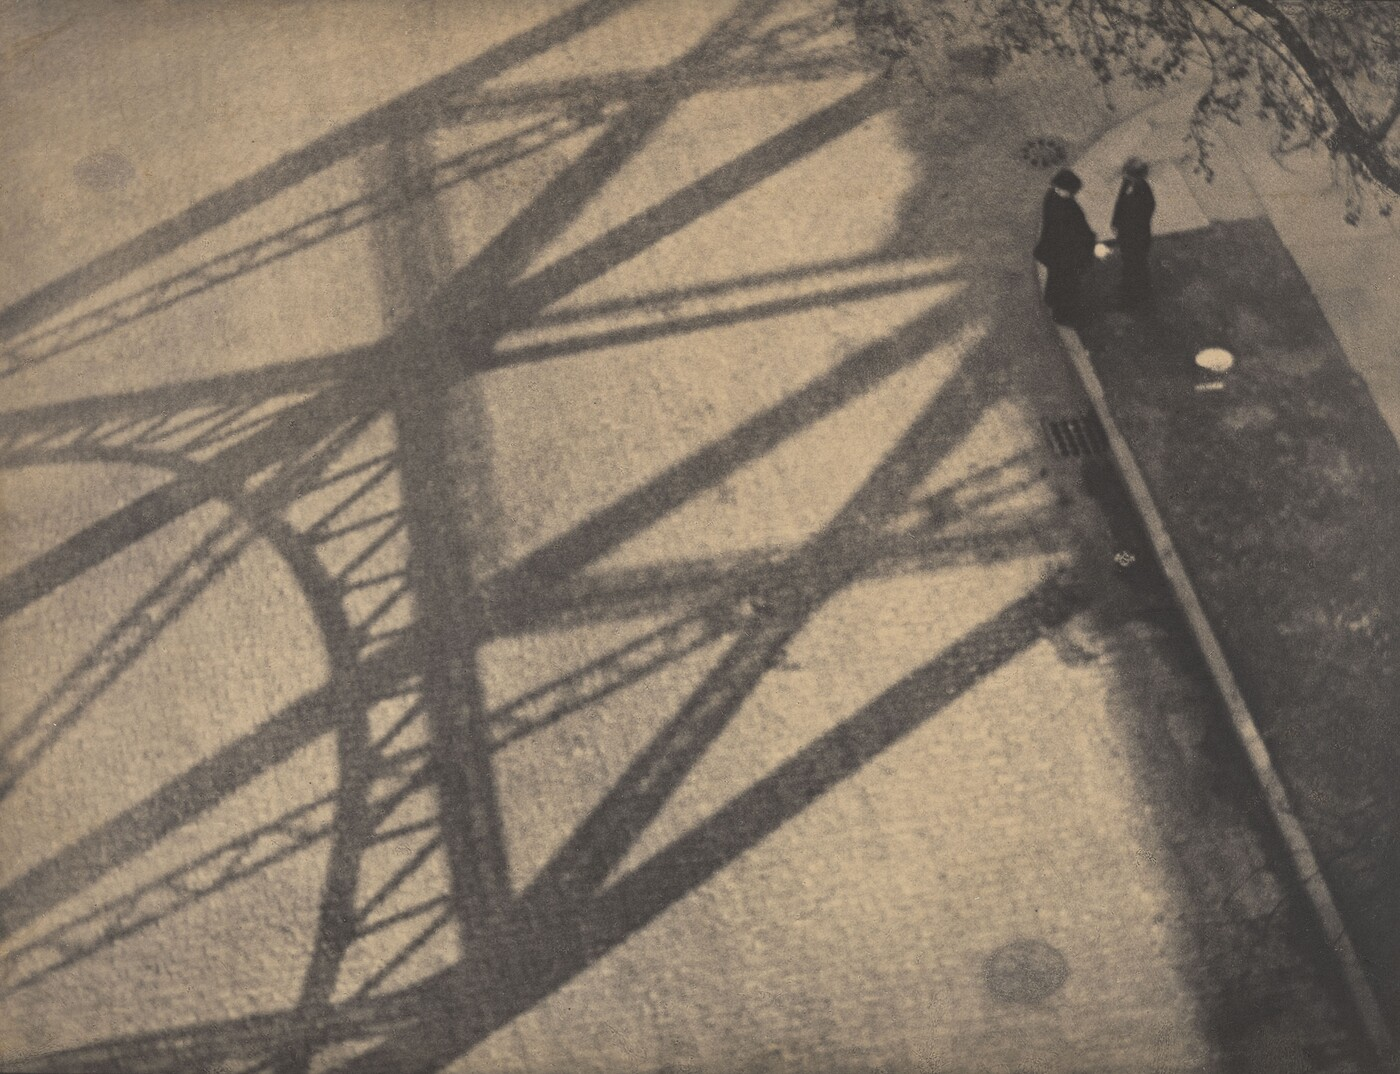 Paul Strand (1890–1976), From the Viaduct, 125th Street, New York, 1916, 1916, Platinum print